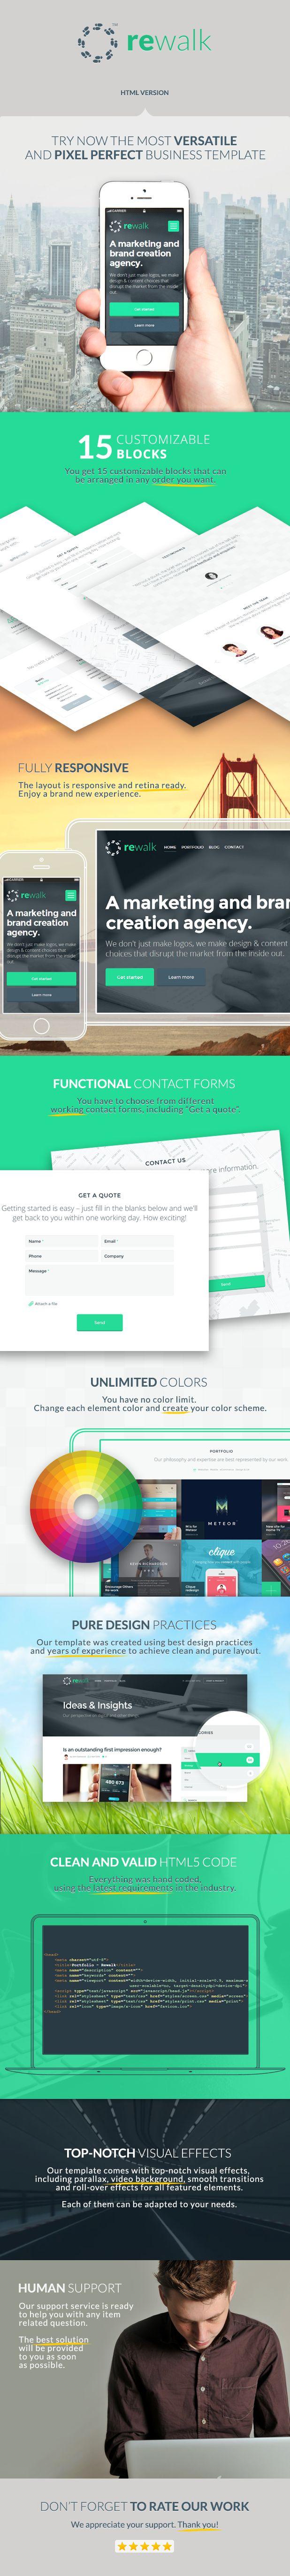 Site Templates - ReWalk - Responsive Business HTML Template | ThemeForest